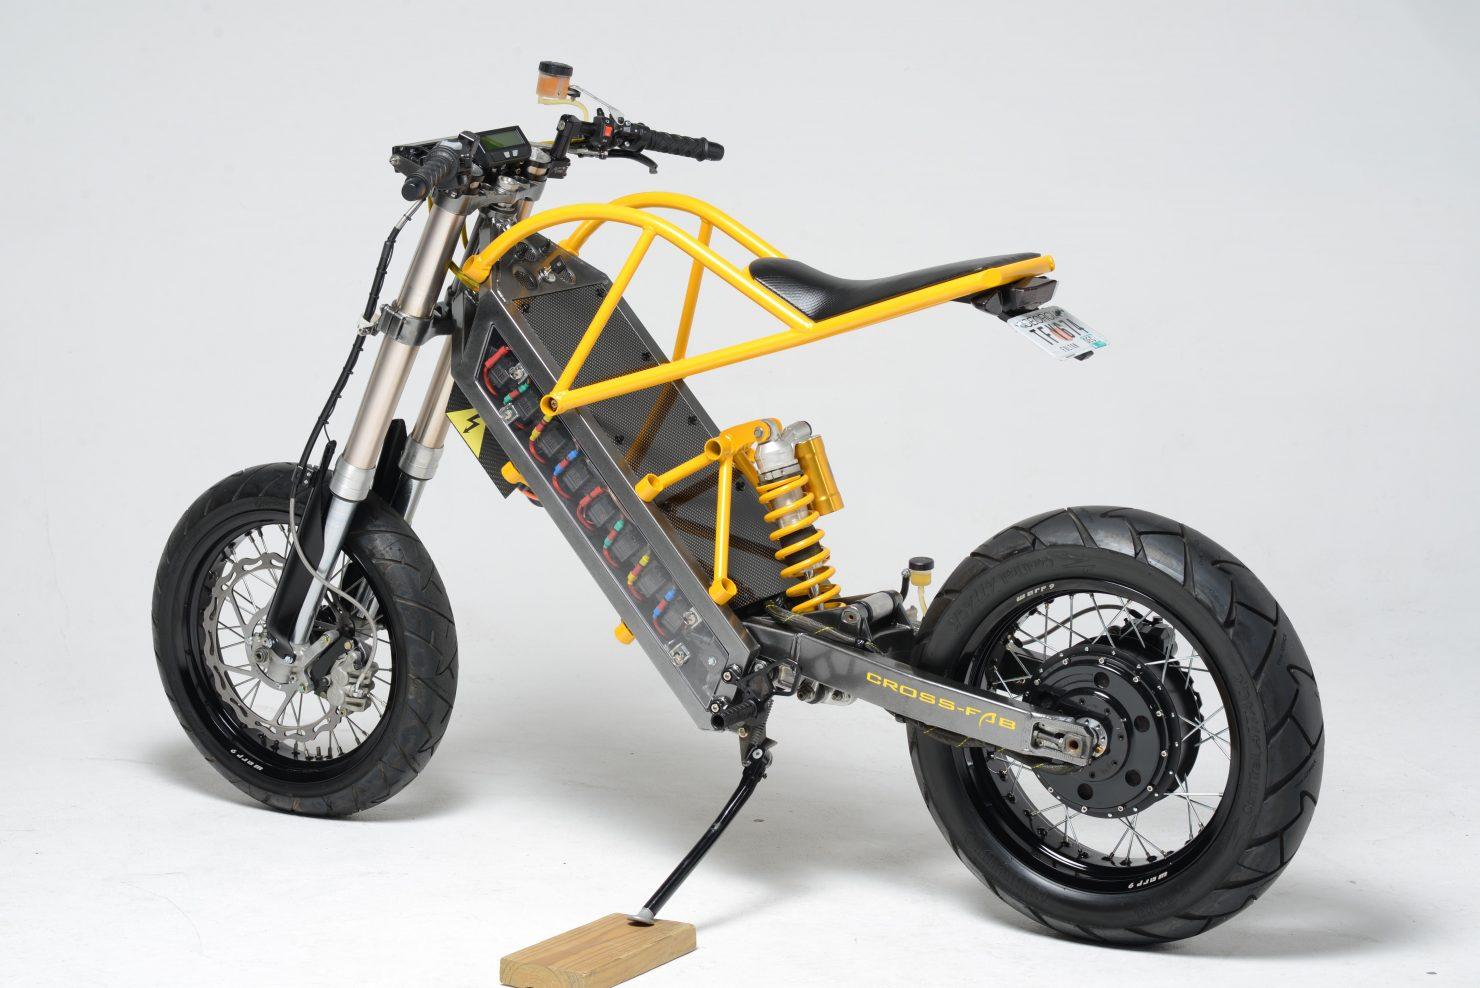 ExoDyne Electric Motorcycle 1 1480x988 - ExoDyne Electric Motorcycle